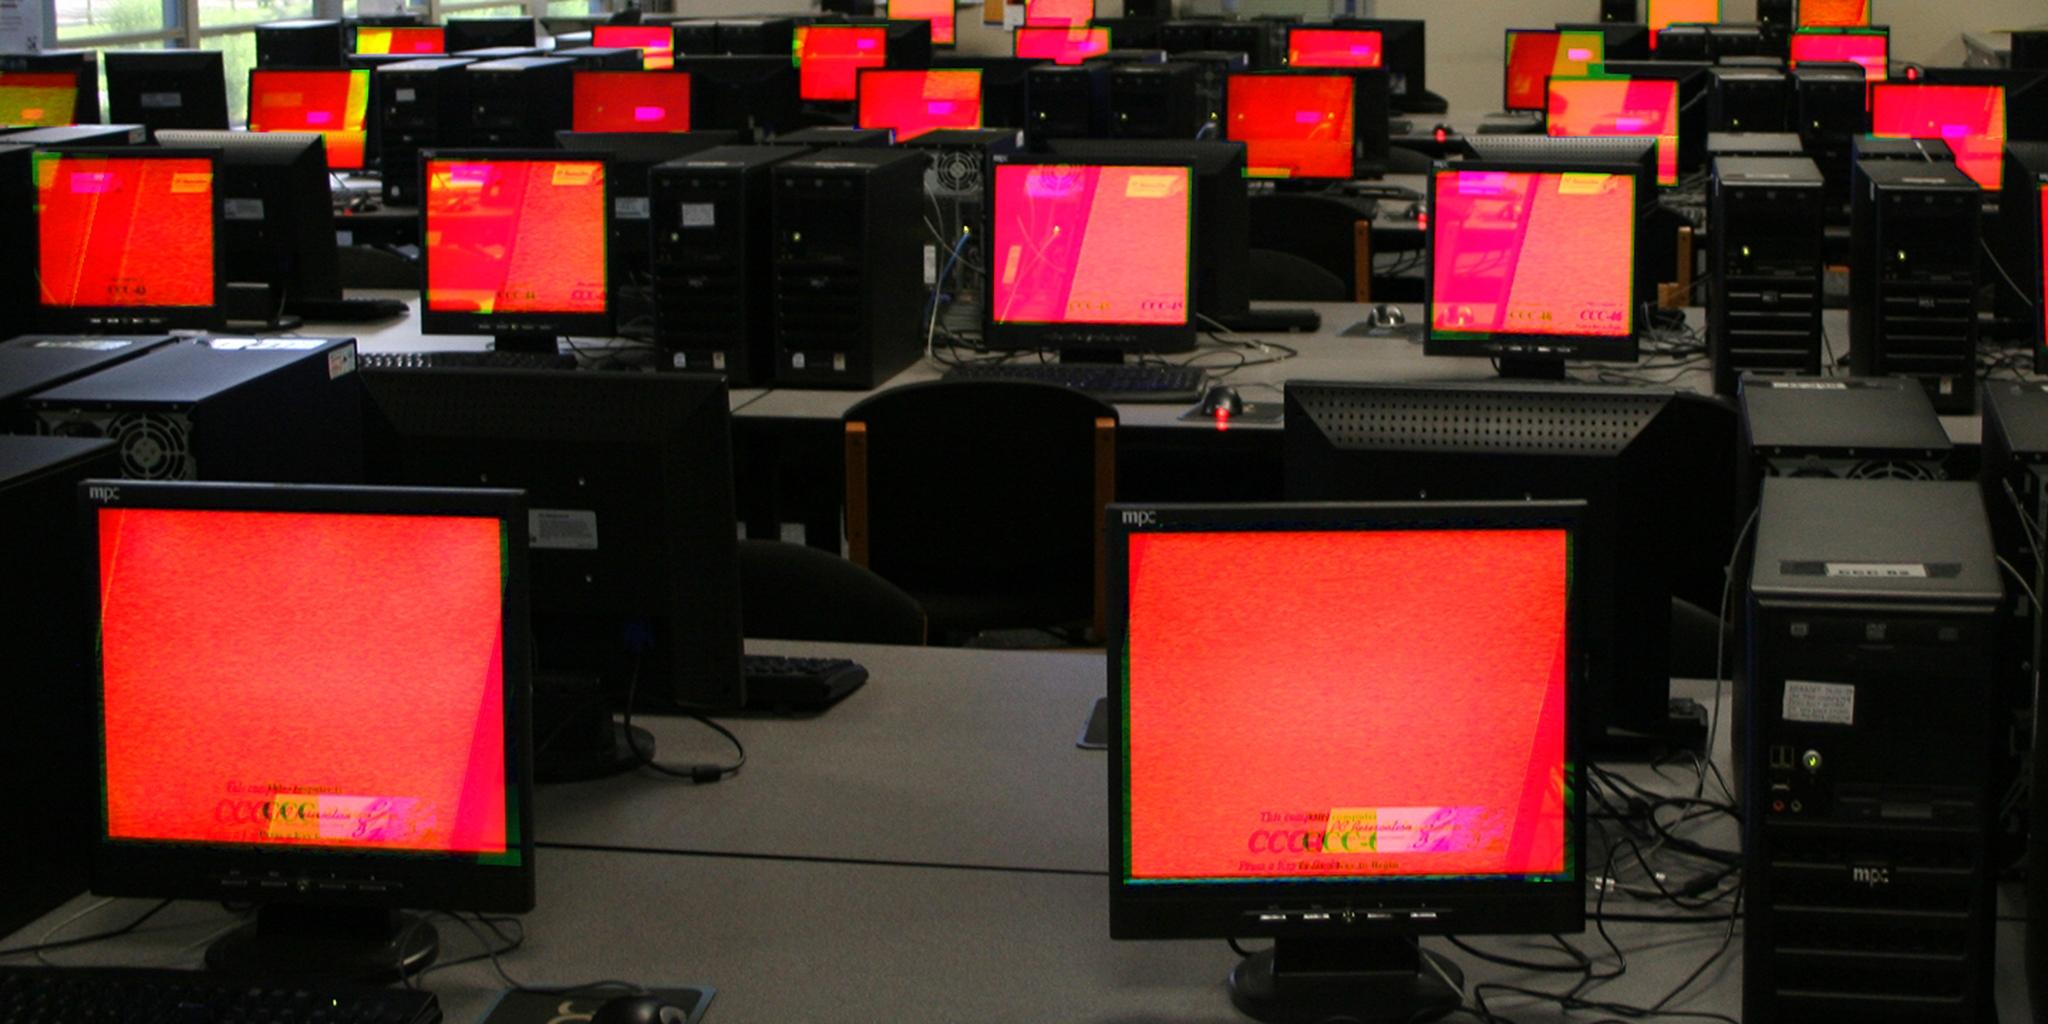 china-computers.jpg (1440×720)